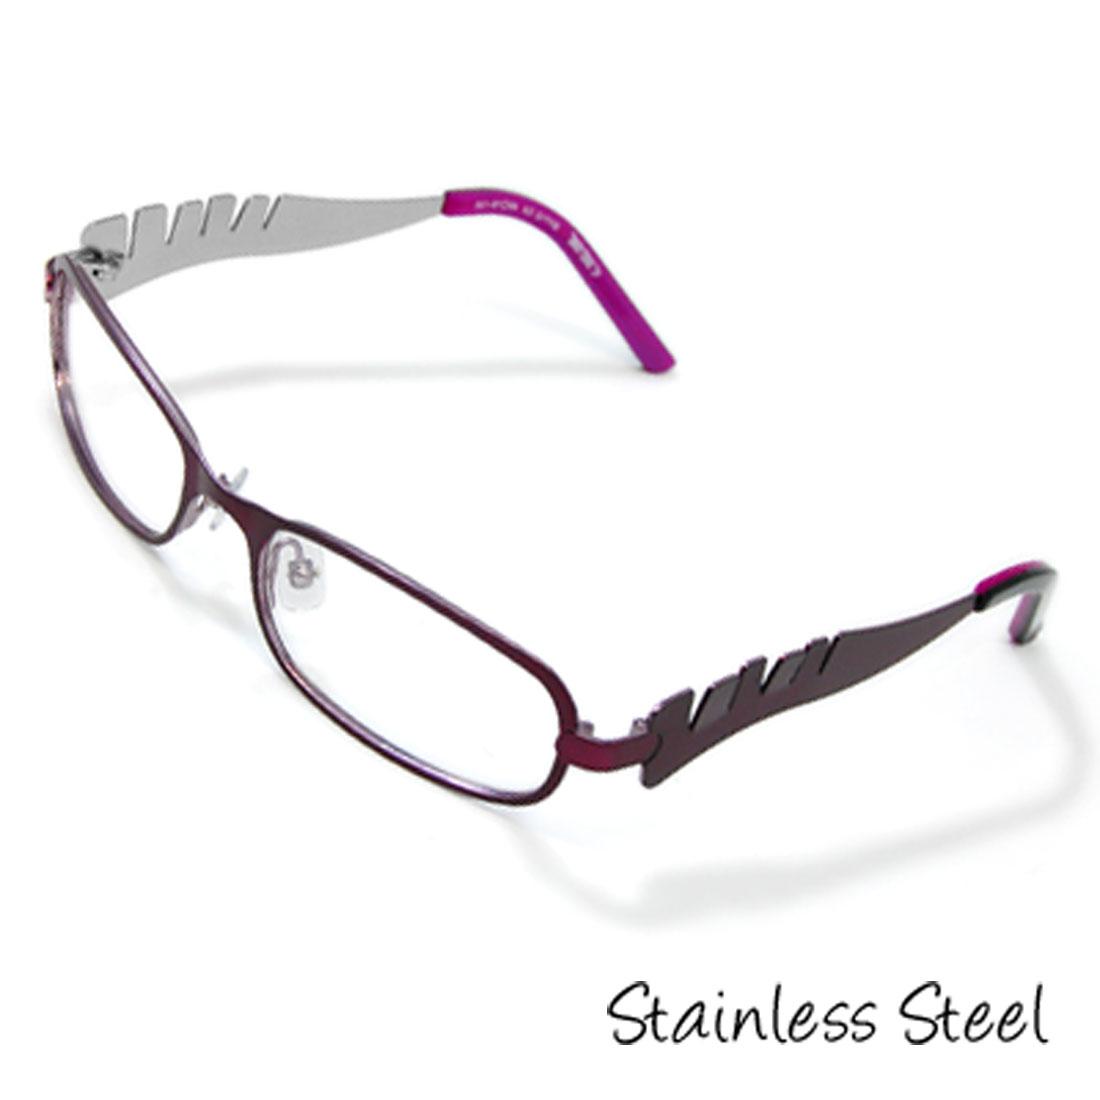 Girls' Stainless Steel Optical Eyeglasses Frame Purple